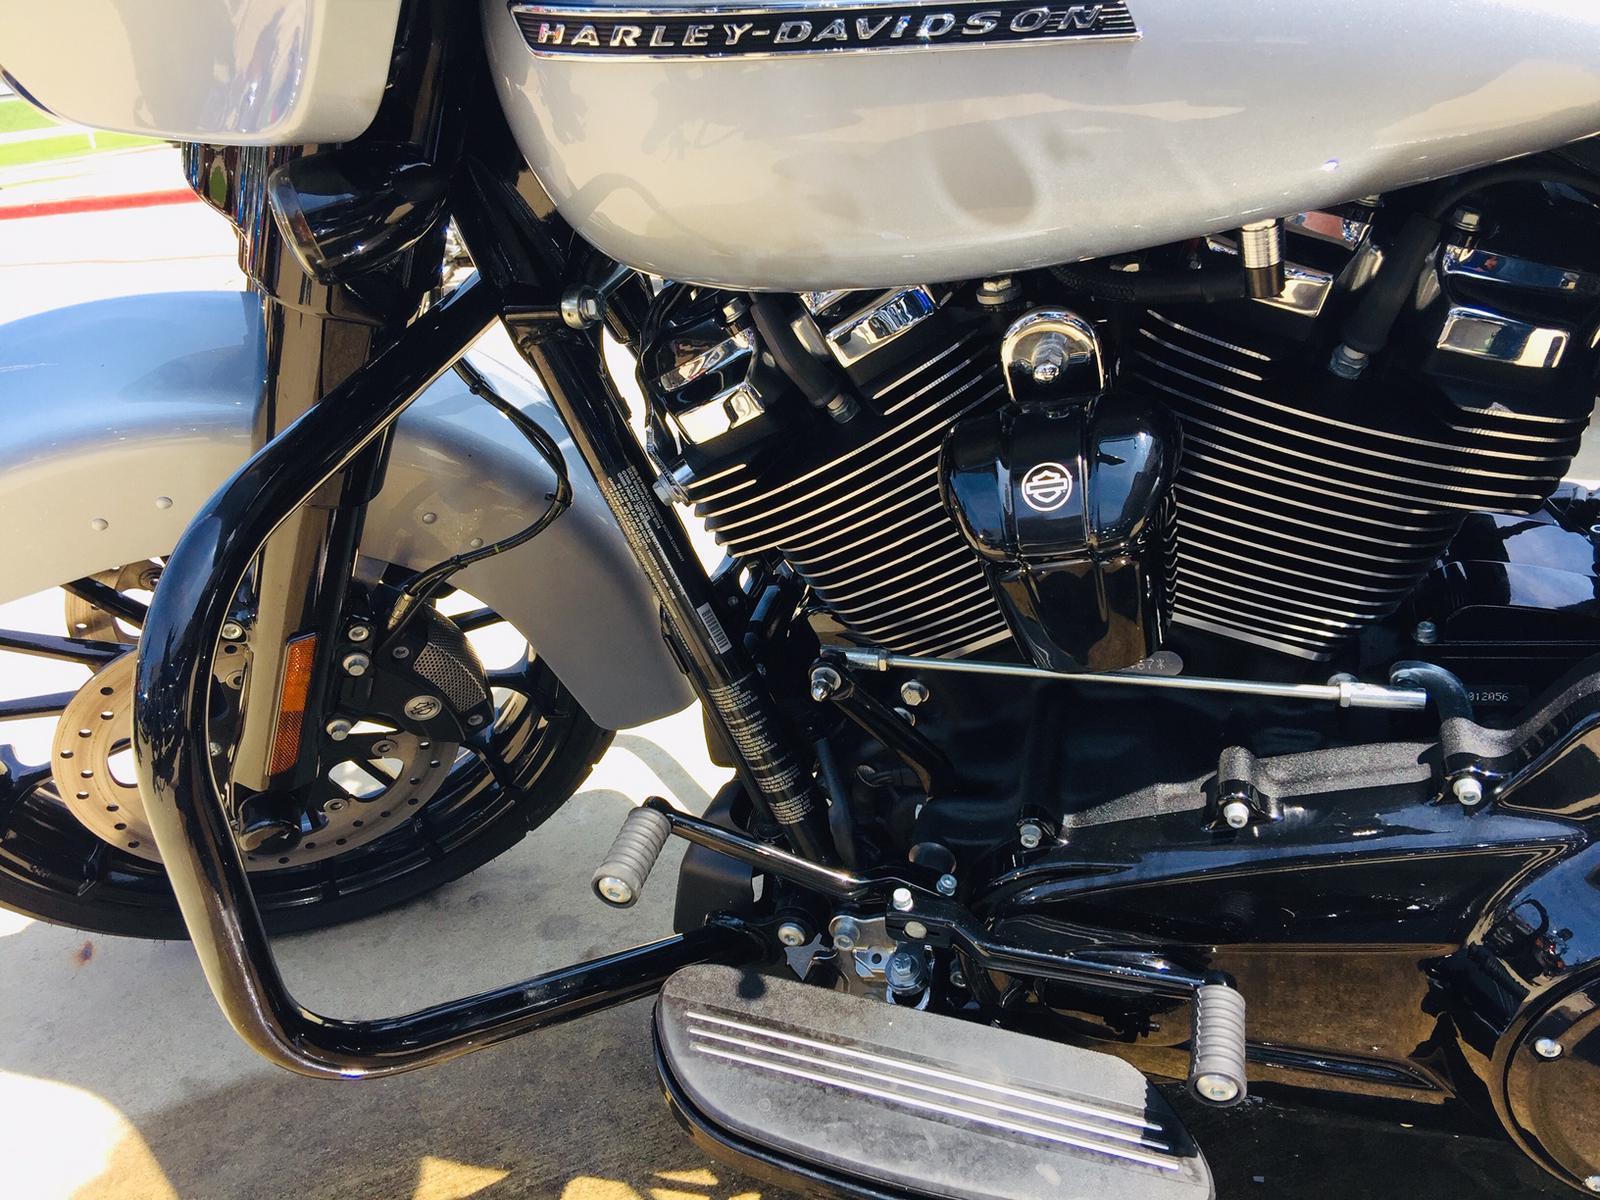 2019 Harley-Davidson® STREET GLIDE SPECIAL